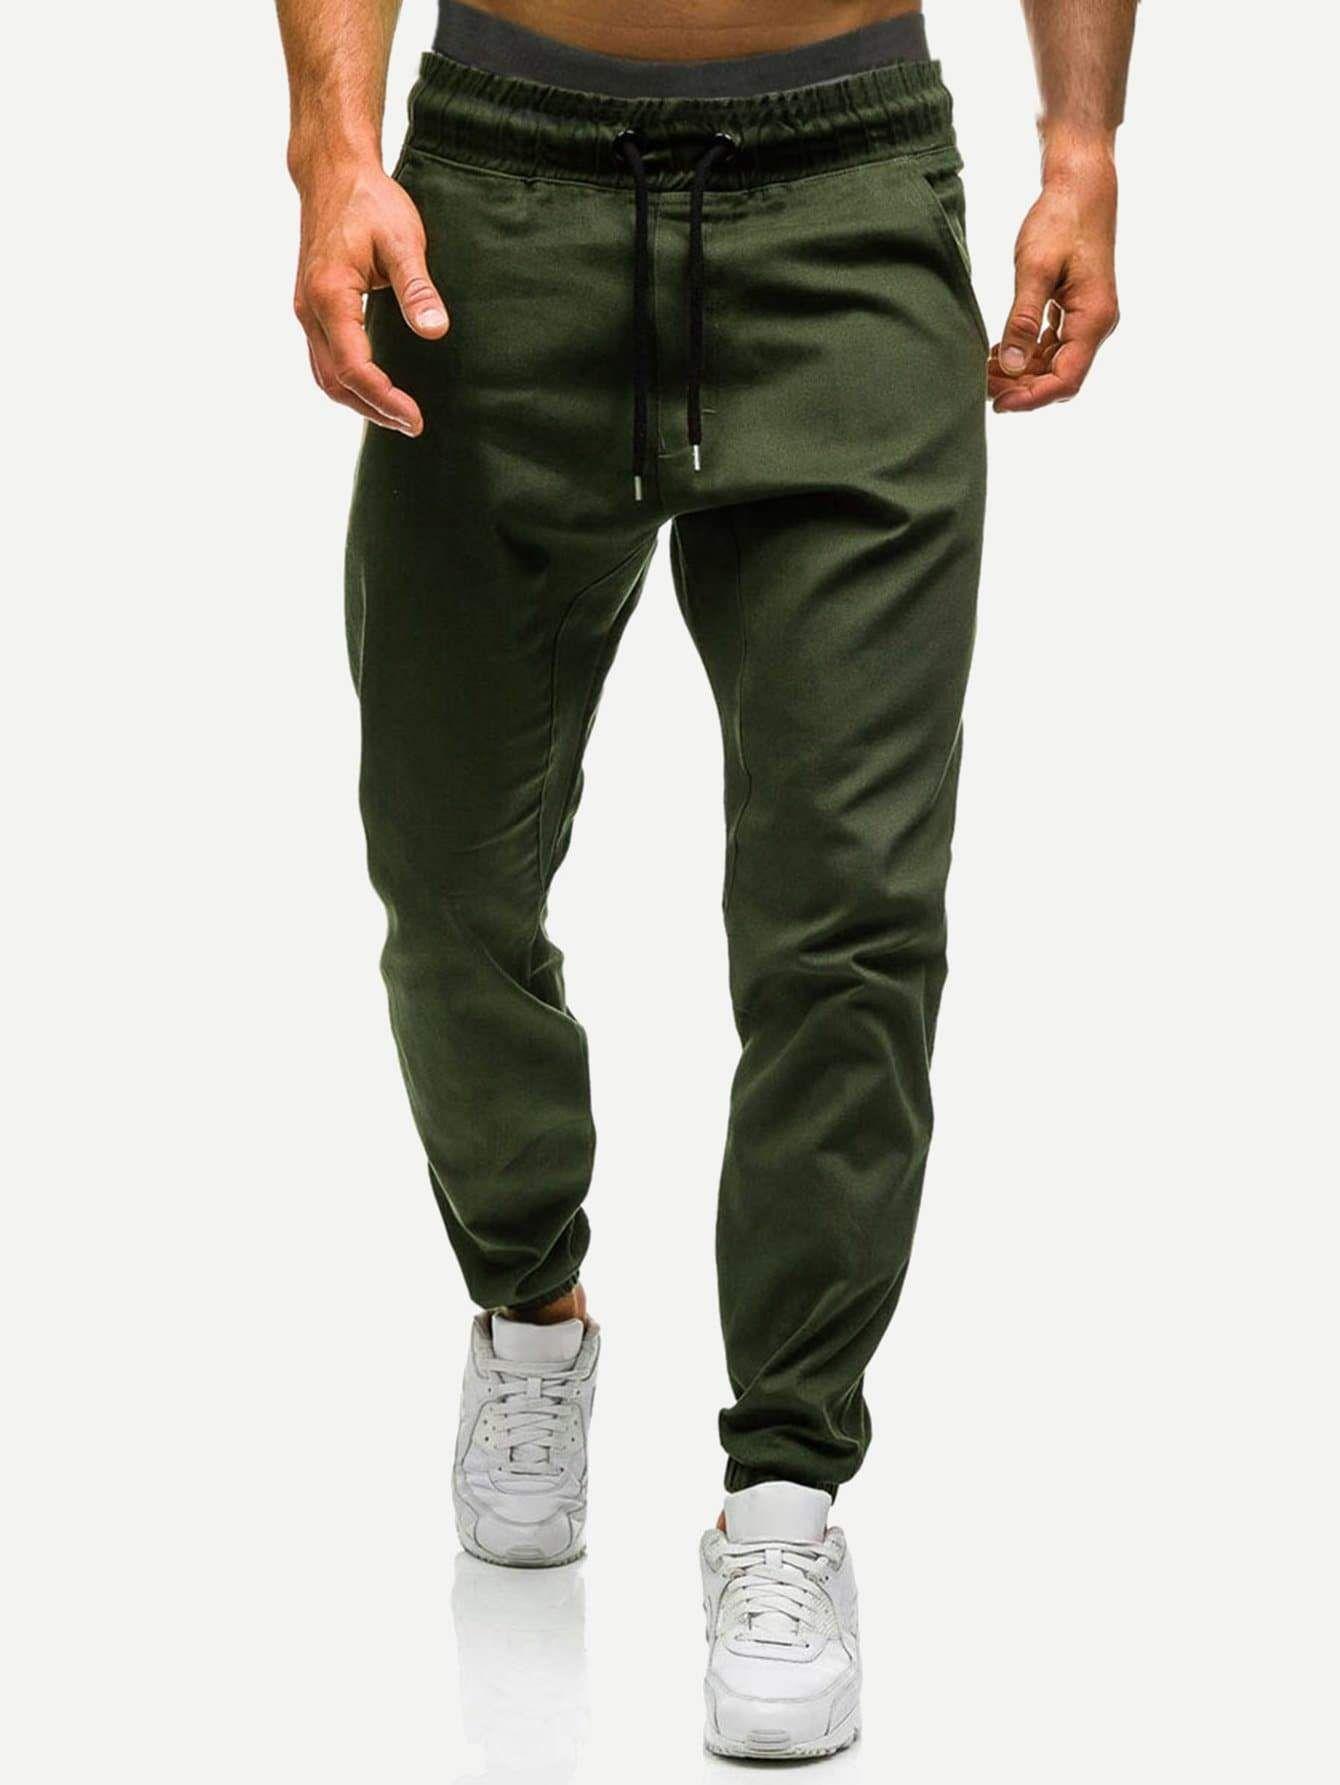 Men Drawstring Waist Solid Joggers Style Swag Streetwear Fashion Dapper Instafashi Jogger Pants Style Mens Pants Casual Bodybuilding Pants